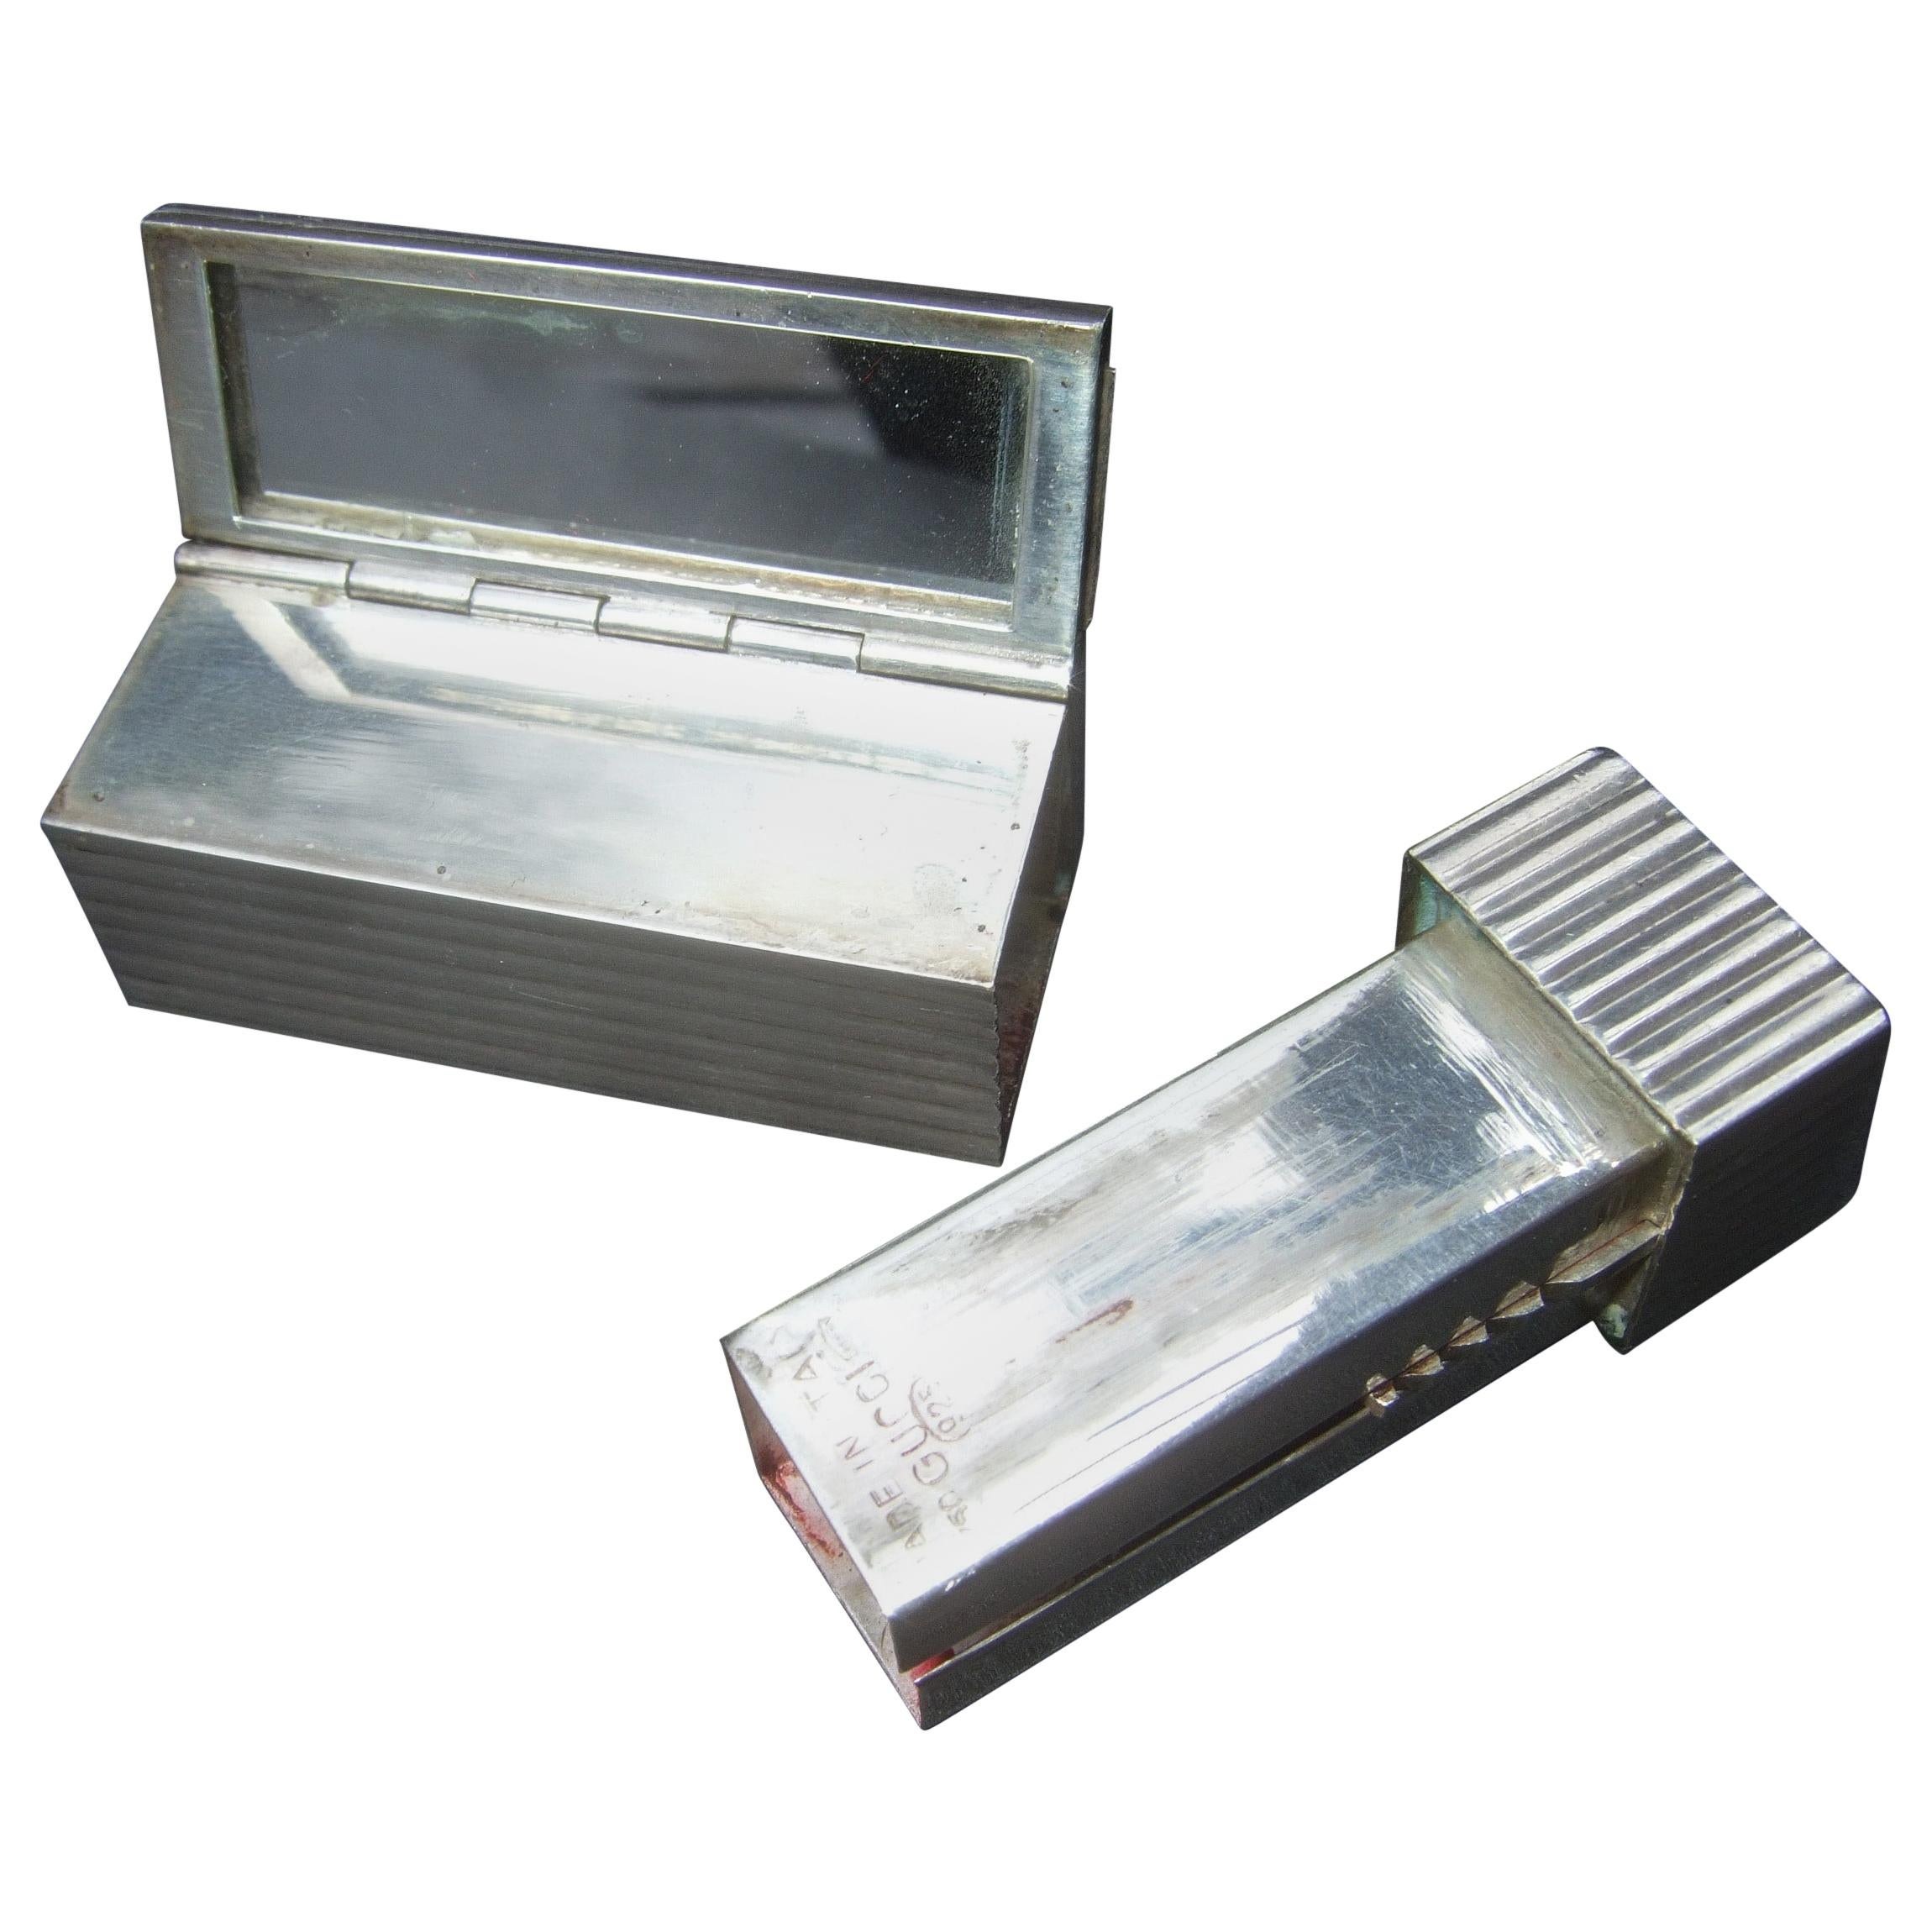 Gucci Italy Rare Sterling Silver Sleek Lipstick Vanity Mirror Case c 1970s